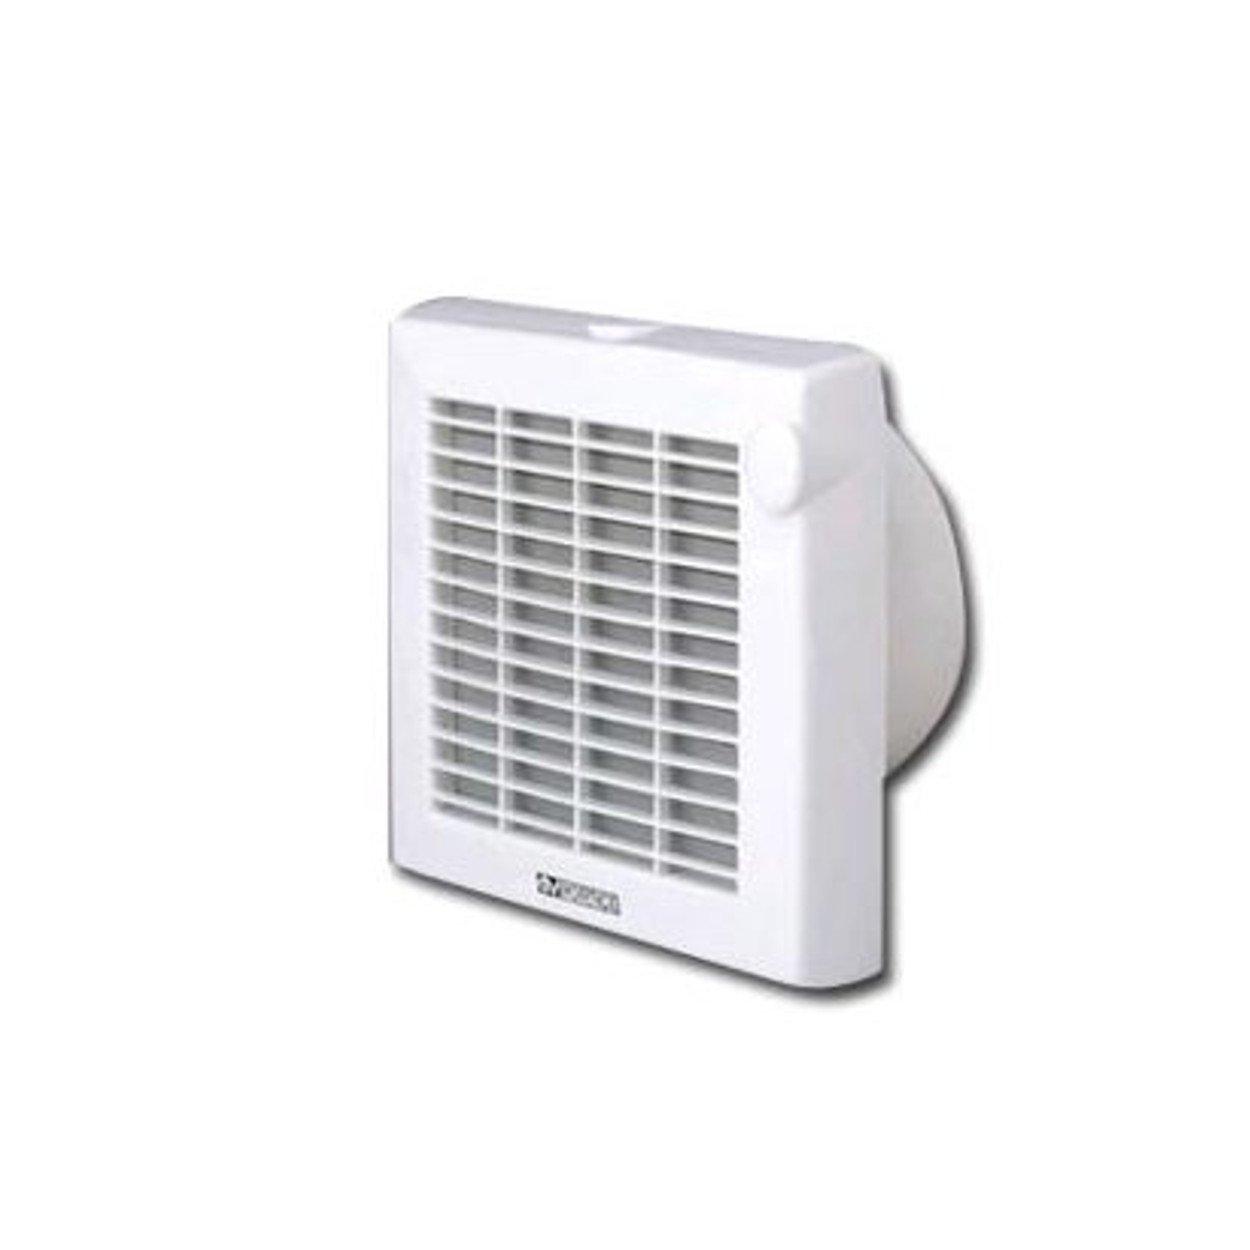 amazon.it: ventilatori bagno: fai da te - Aspiratori Da Cucina Vortice